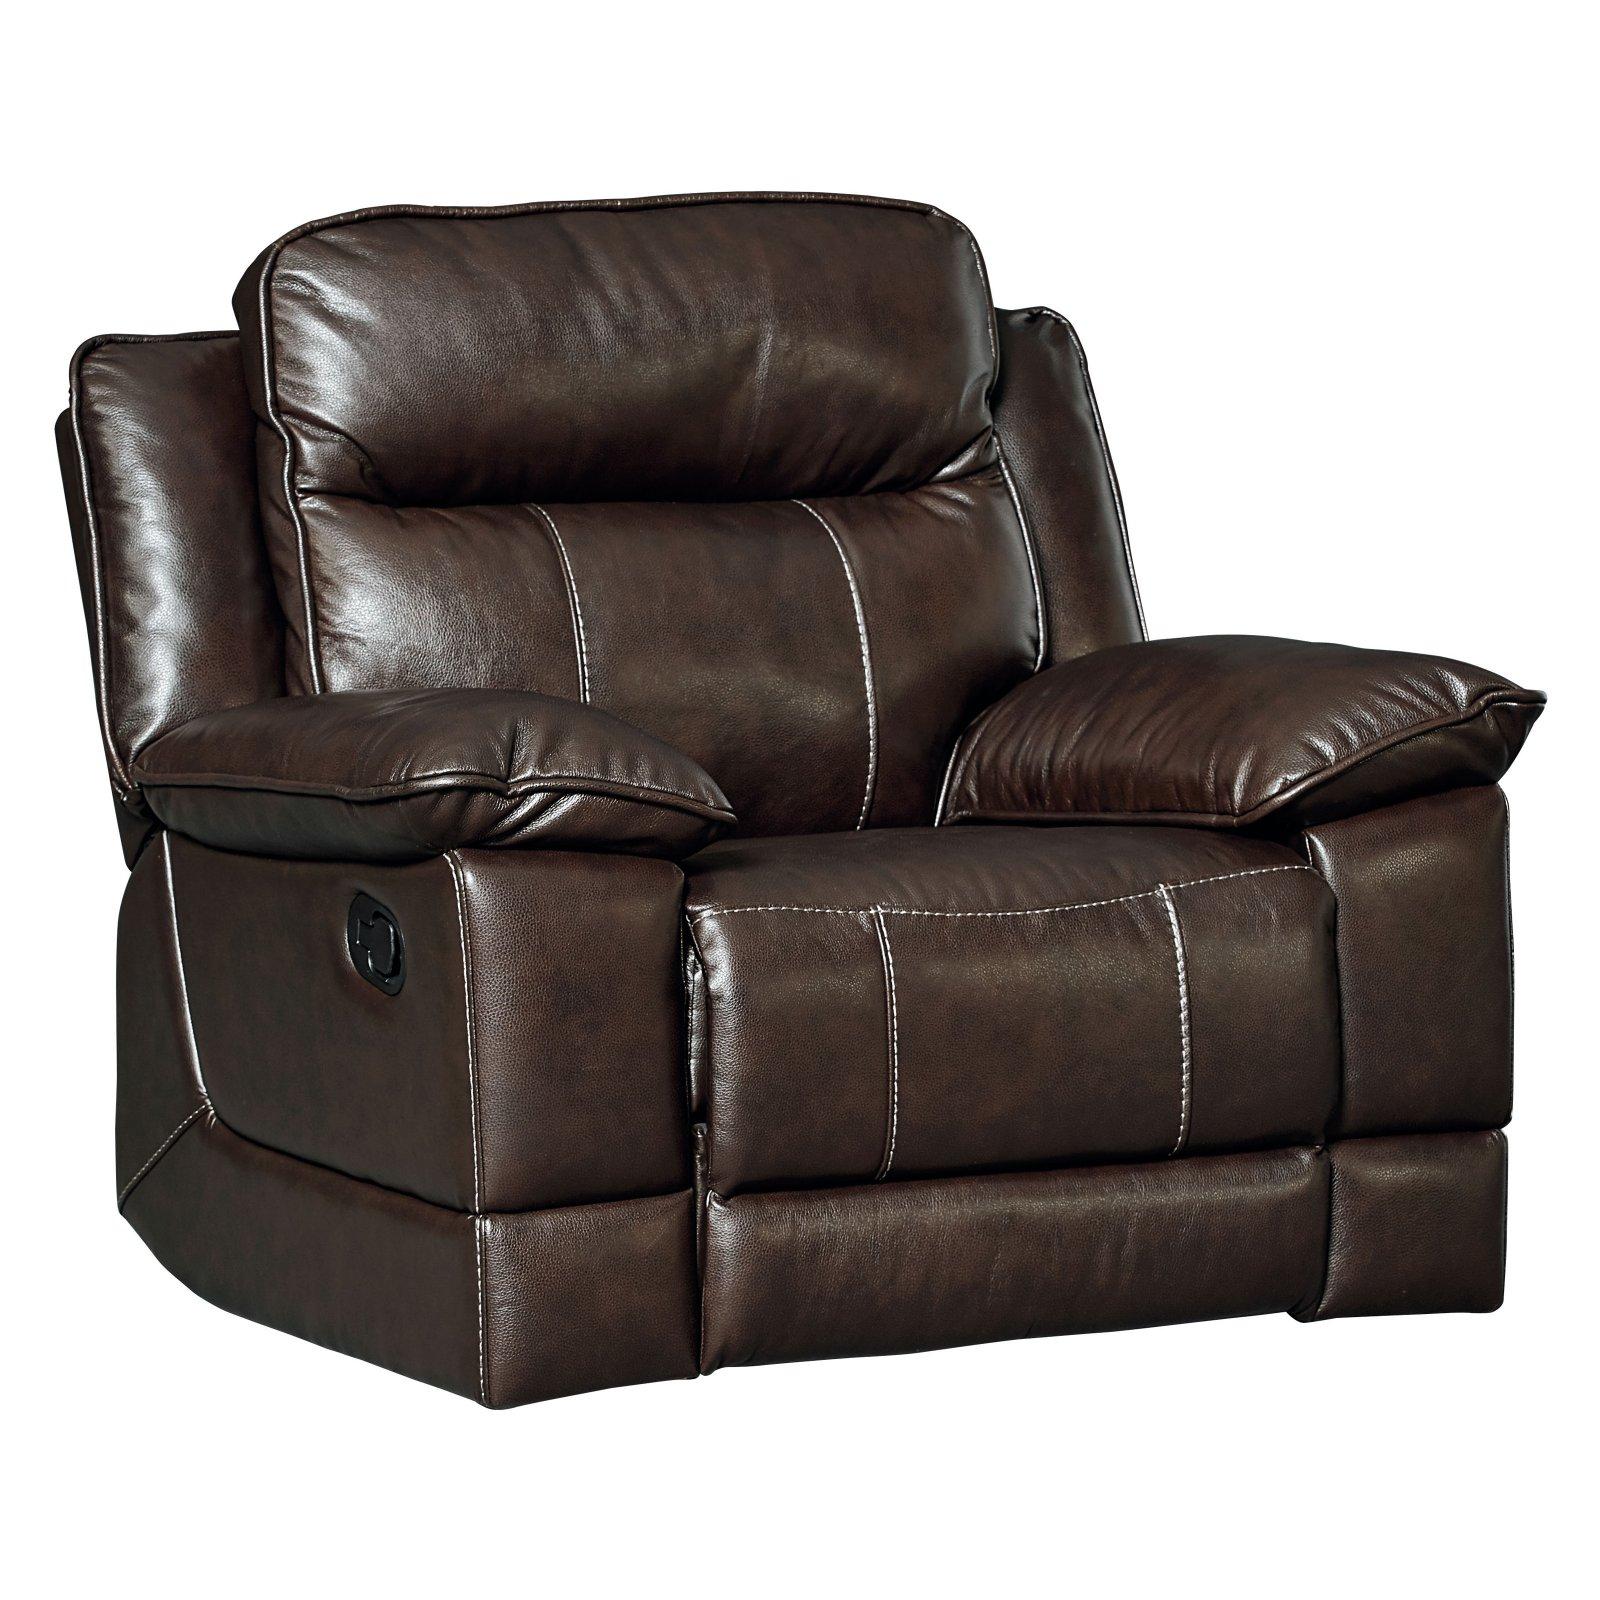 Standard Furniture Sequoia Manual Rocker Recliner In Leather